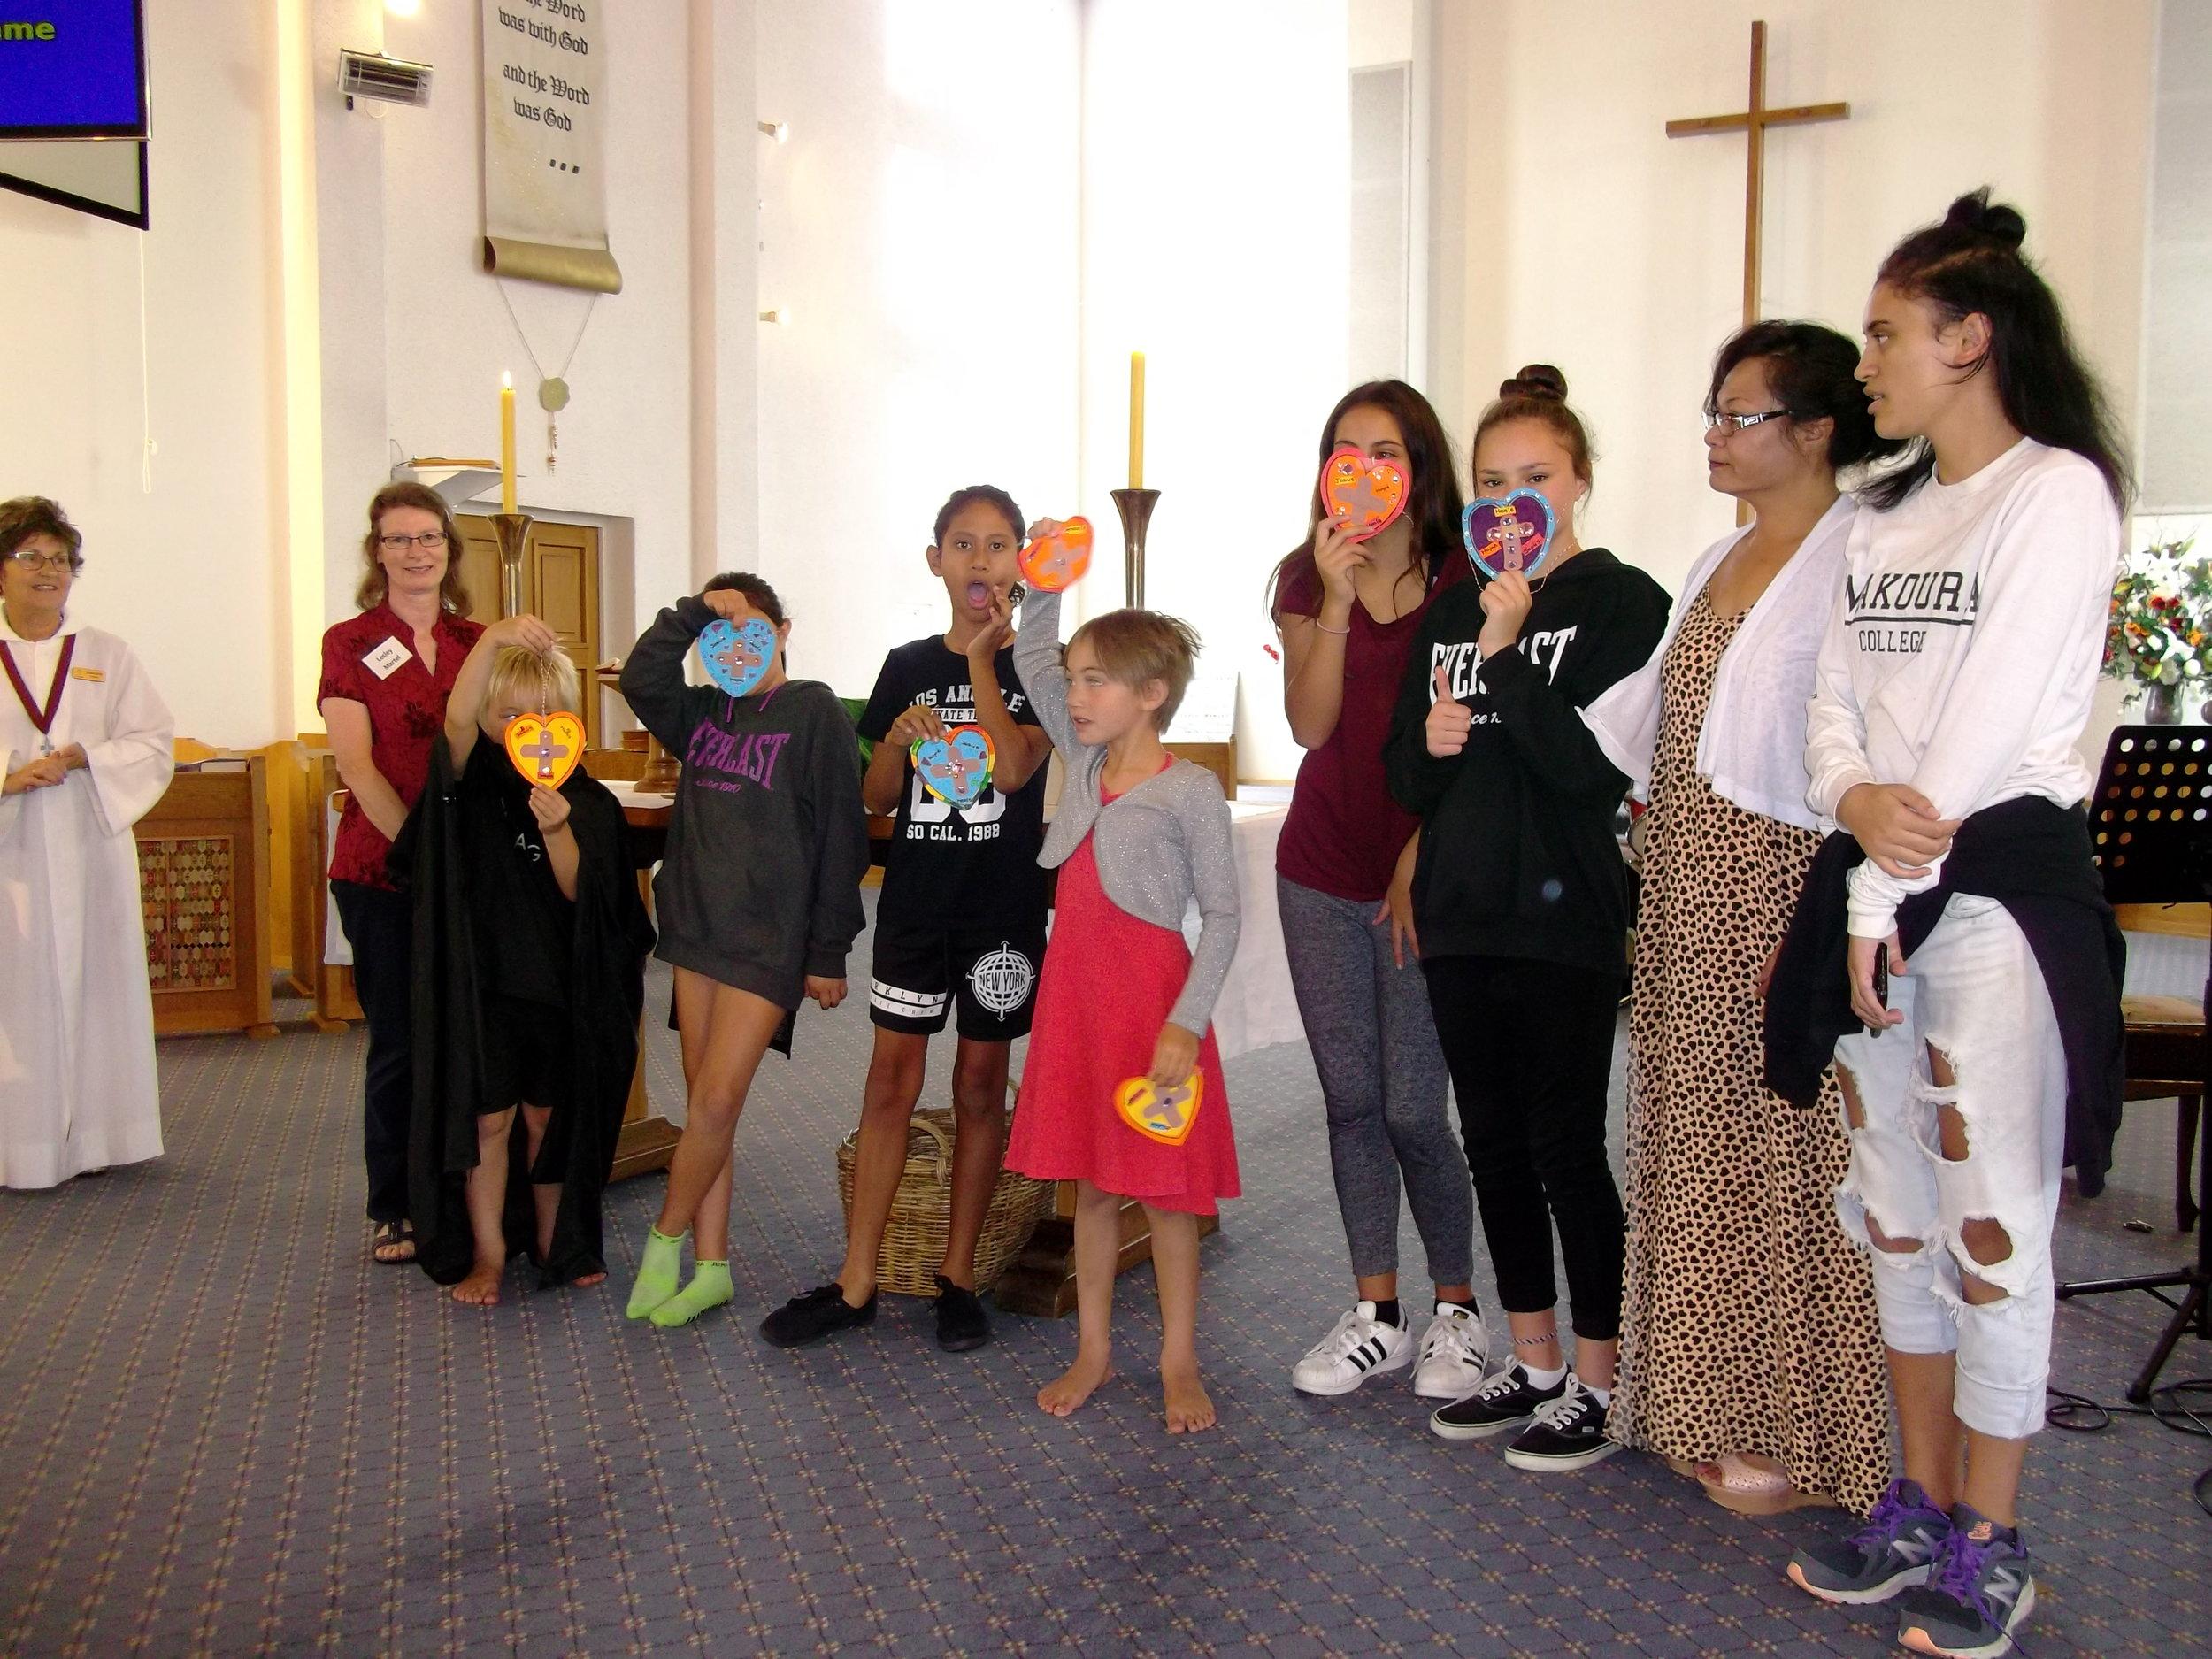 11-2-18 Children & helpers, end of service (2).jpg